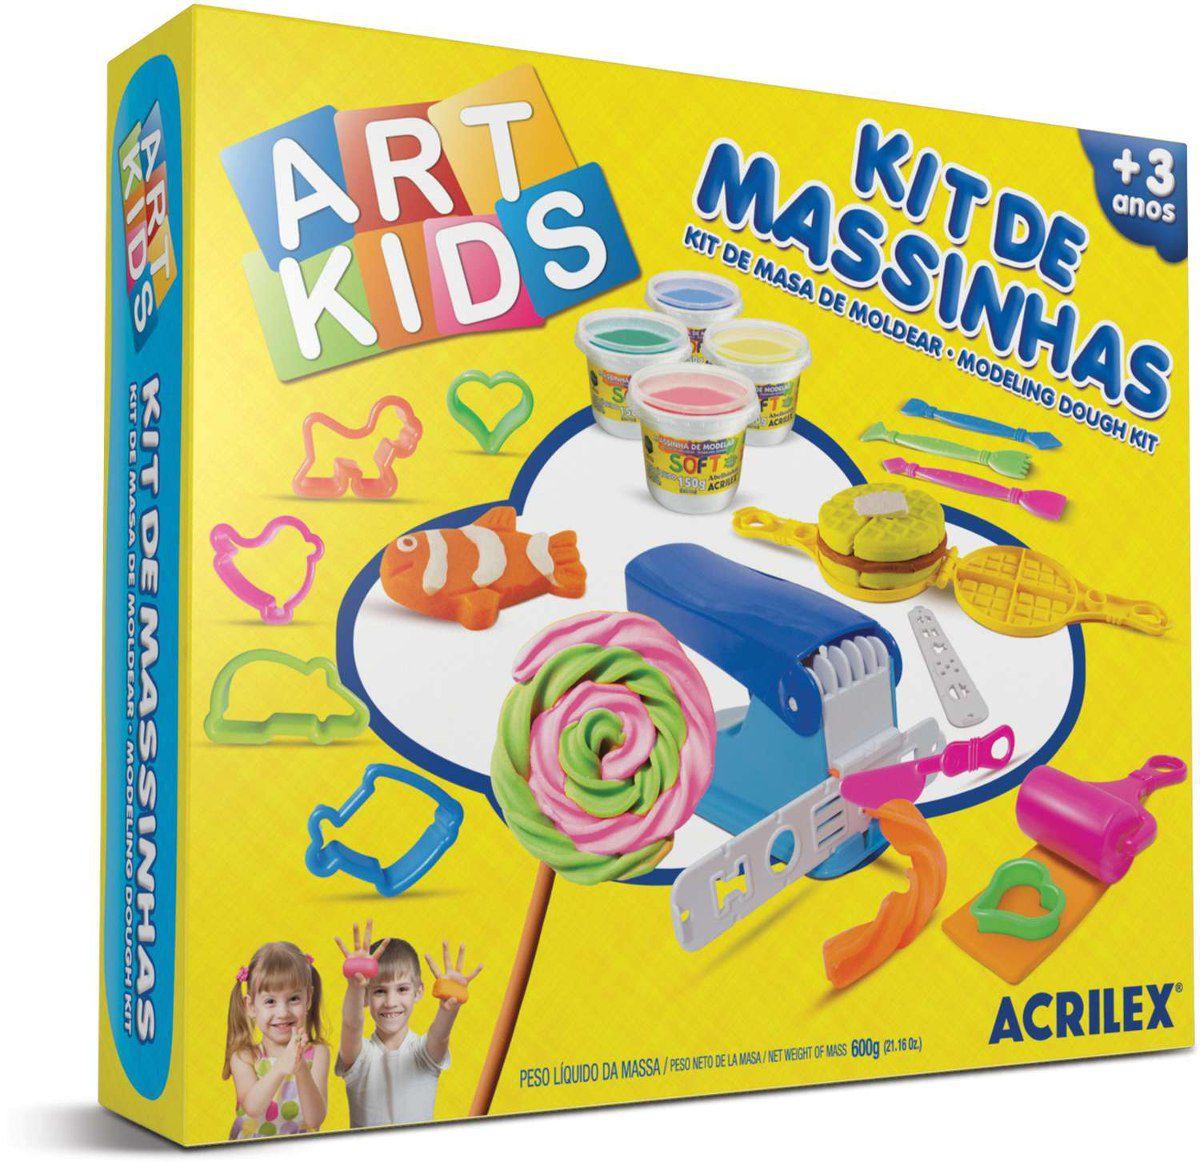 Kit De Massinhas Criativa - Art Kids Acrilex